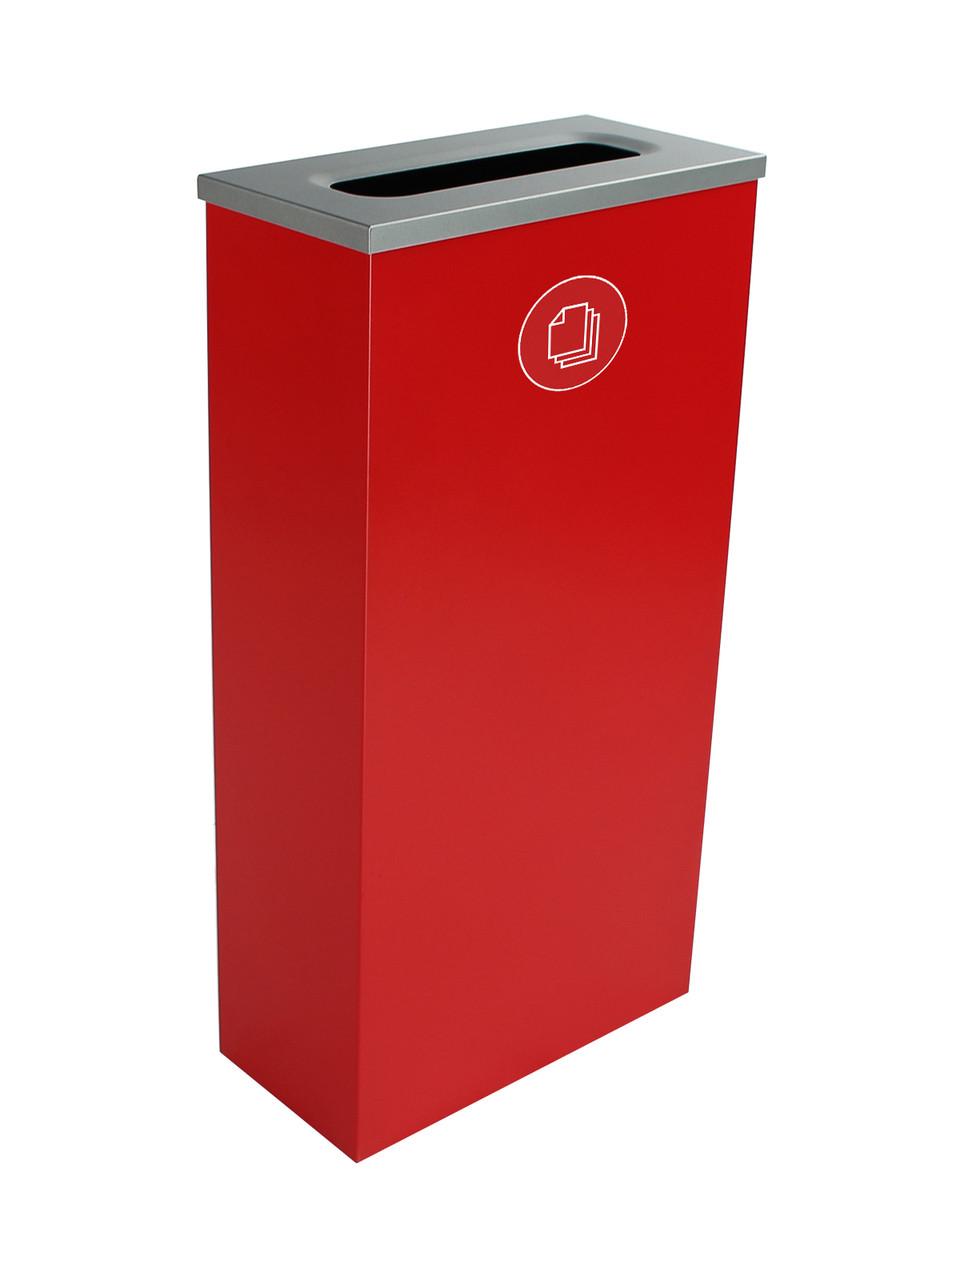 10 Gallon Steel Spectrum Slim Paper Collector Recycle Bin Red 8107066-3